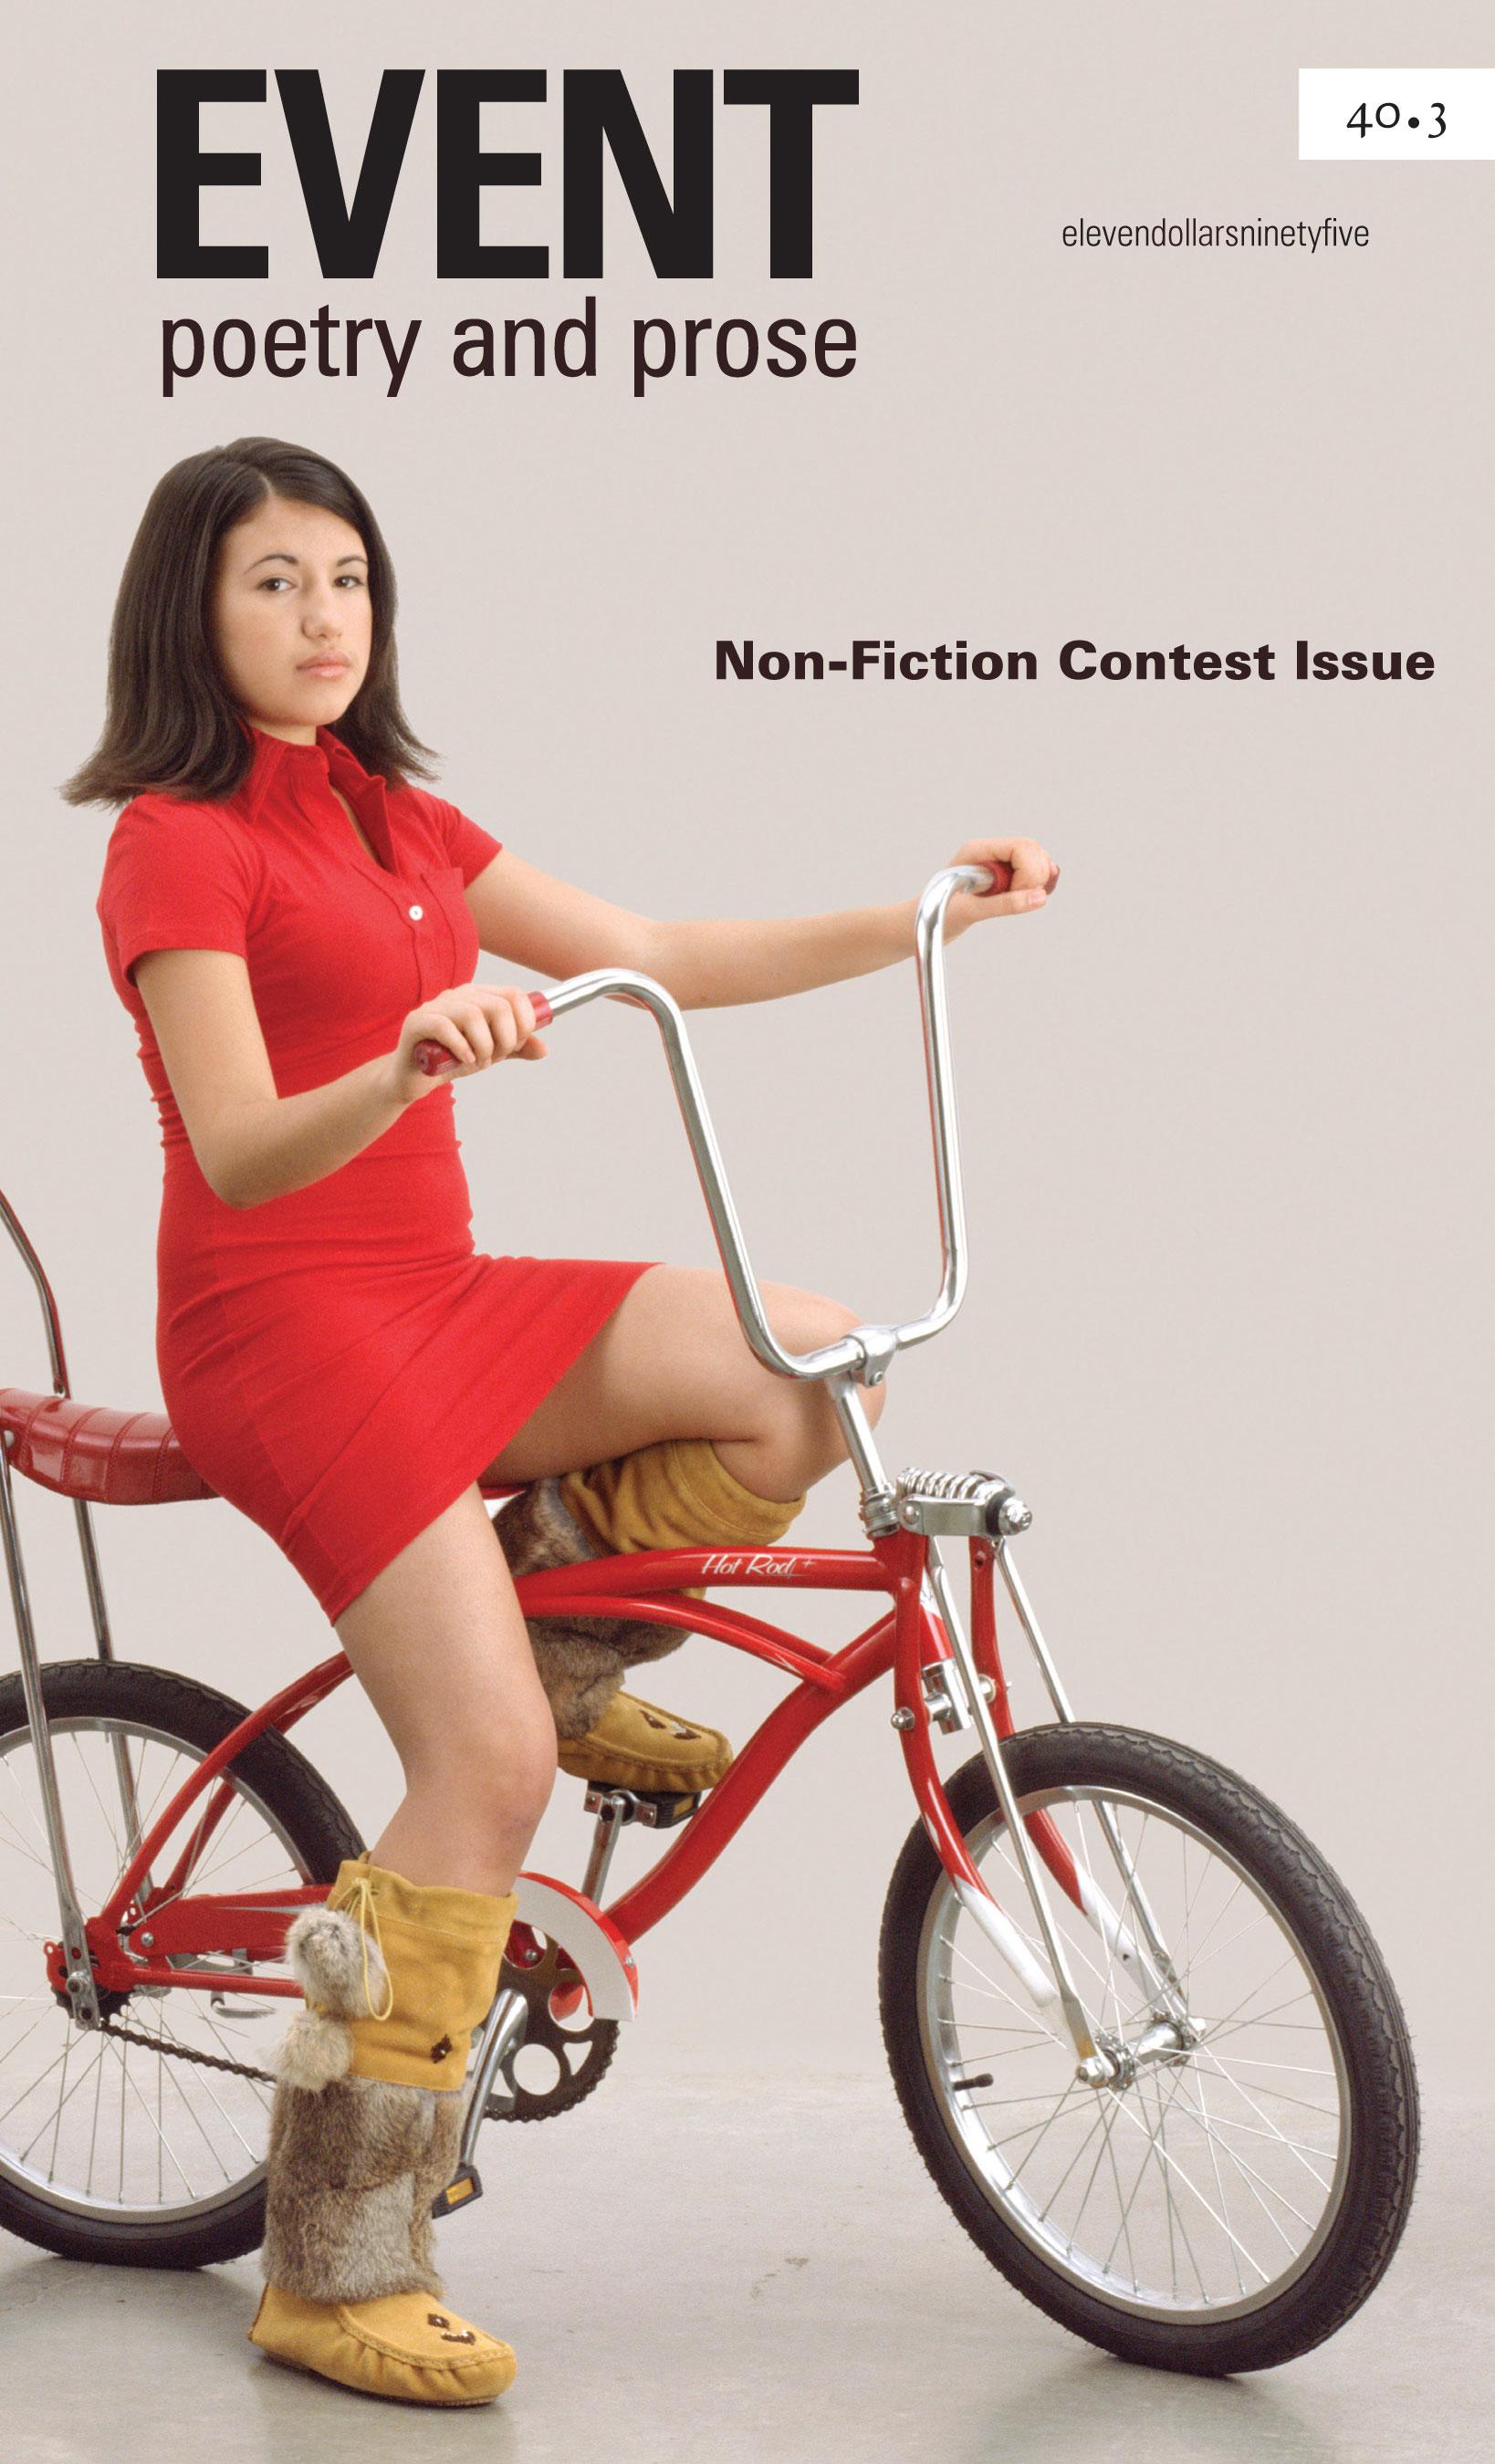 EVENT 40/3: Non Fiction Contest Issue